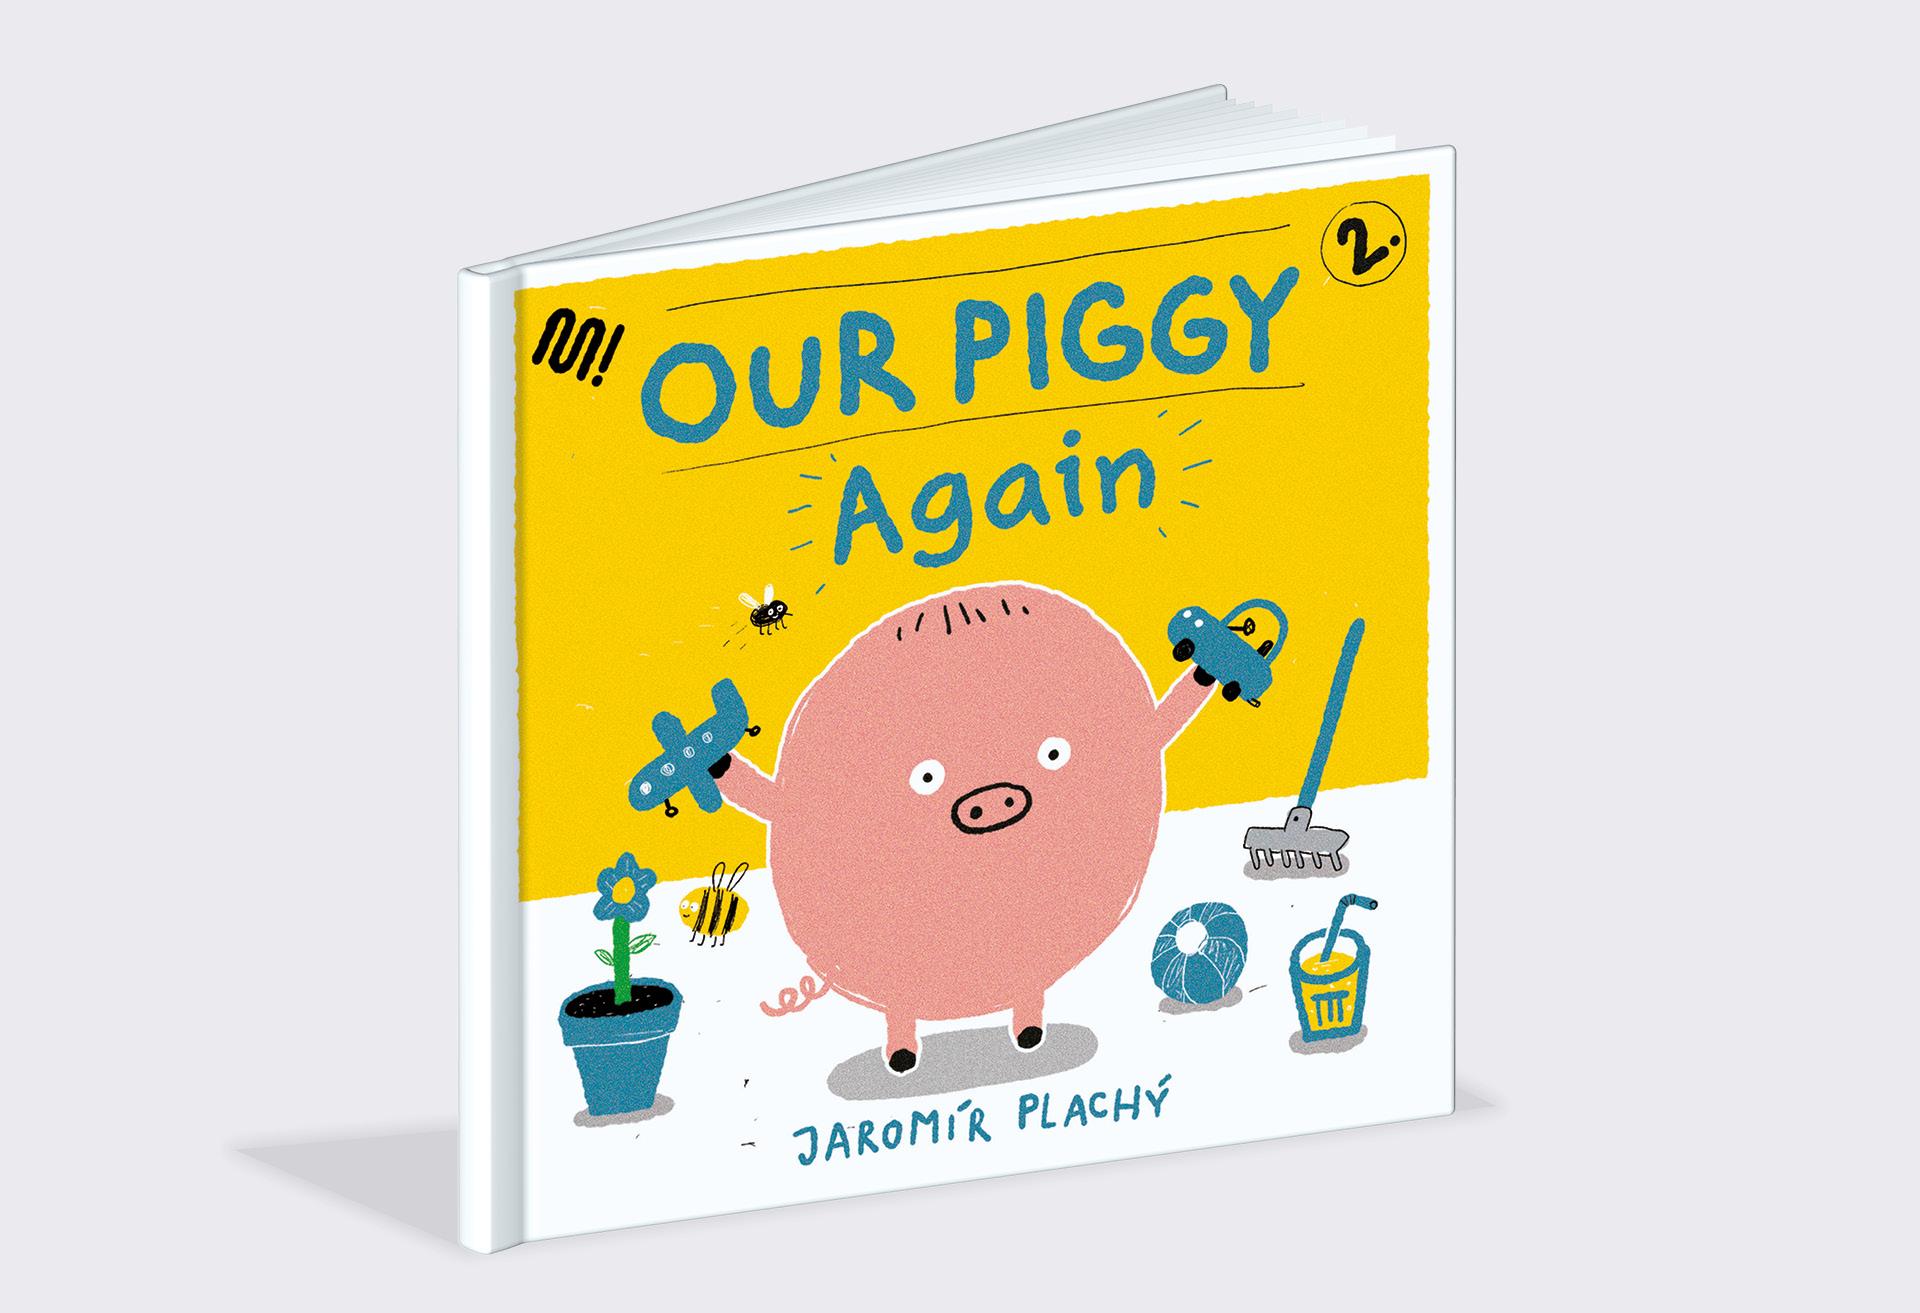 2_Our piggy again_big